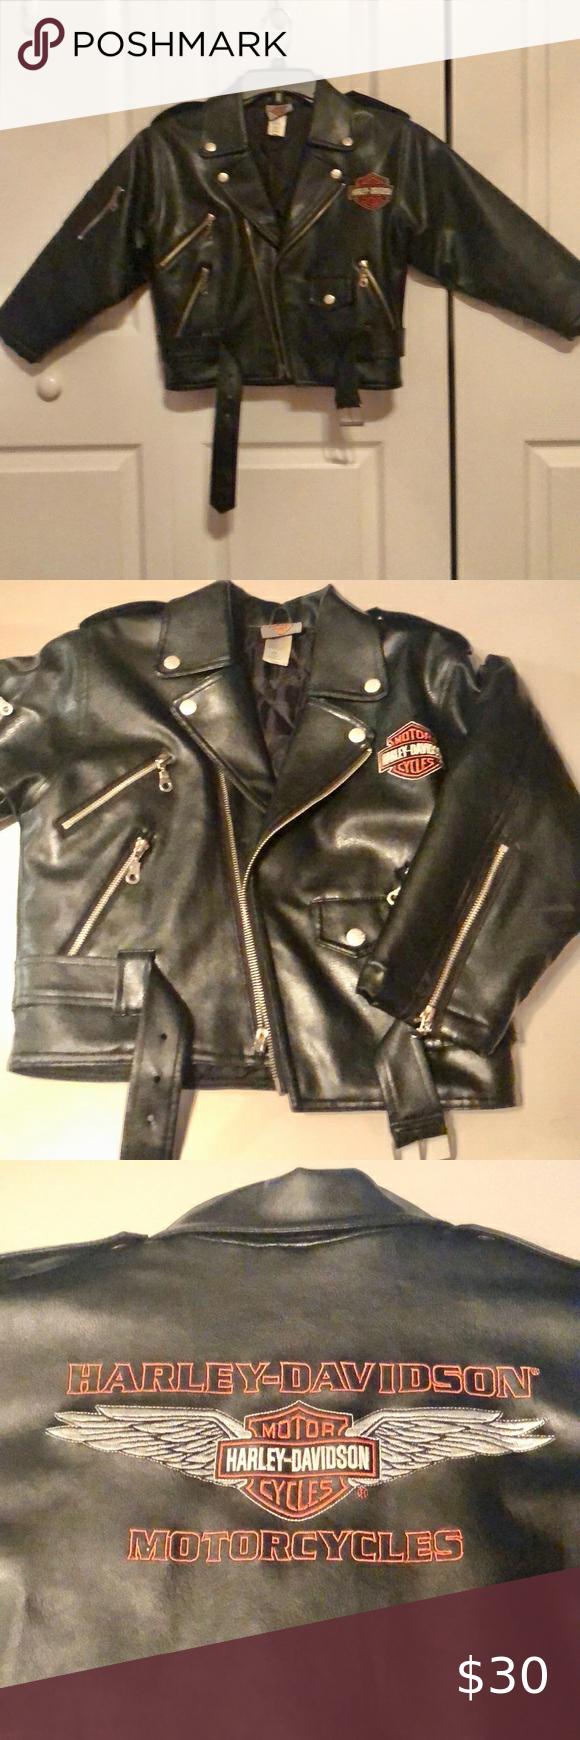 35 Harley Davidson Kids Motor Jacket Size 7 Harley Davidson Kids Harley Davidson Jacket Harley Davidson [ 1740 x 580 Pixel ]